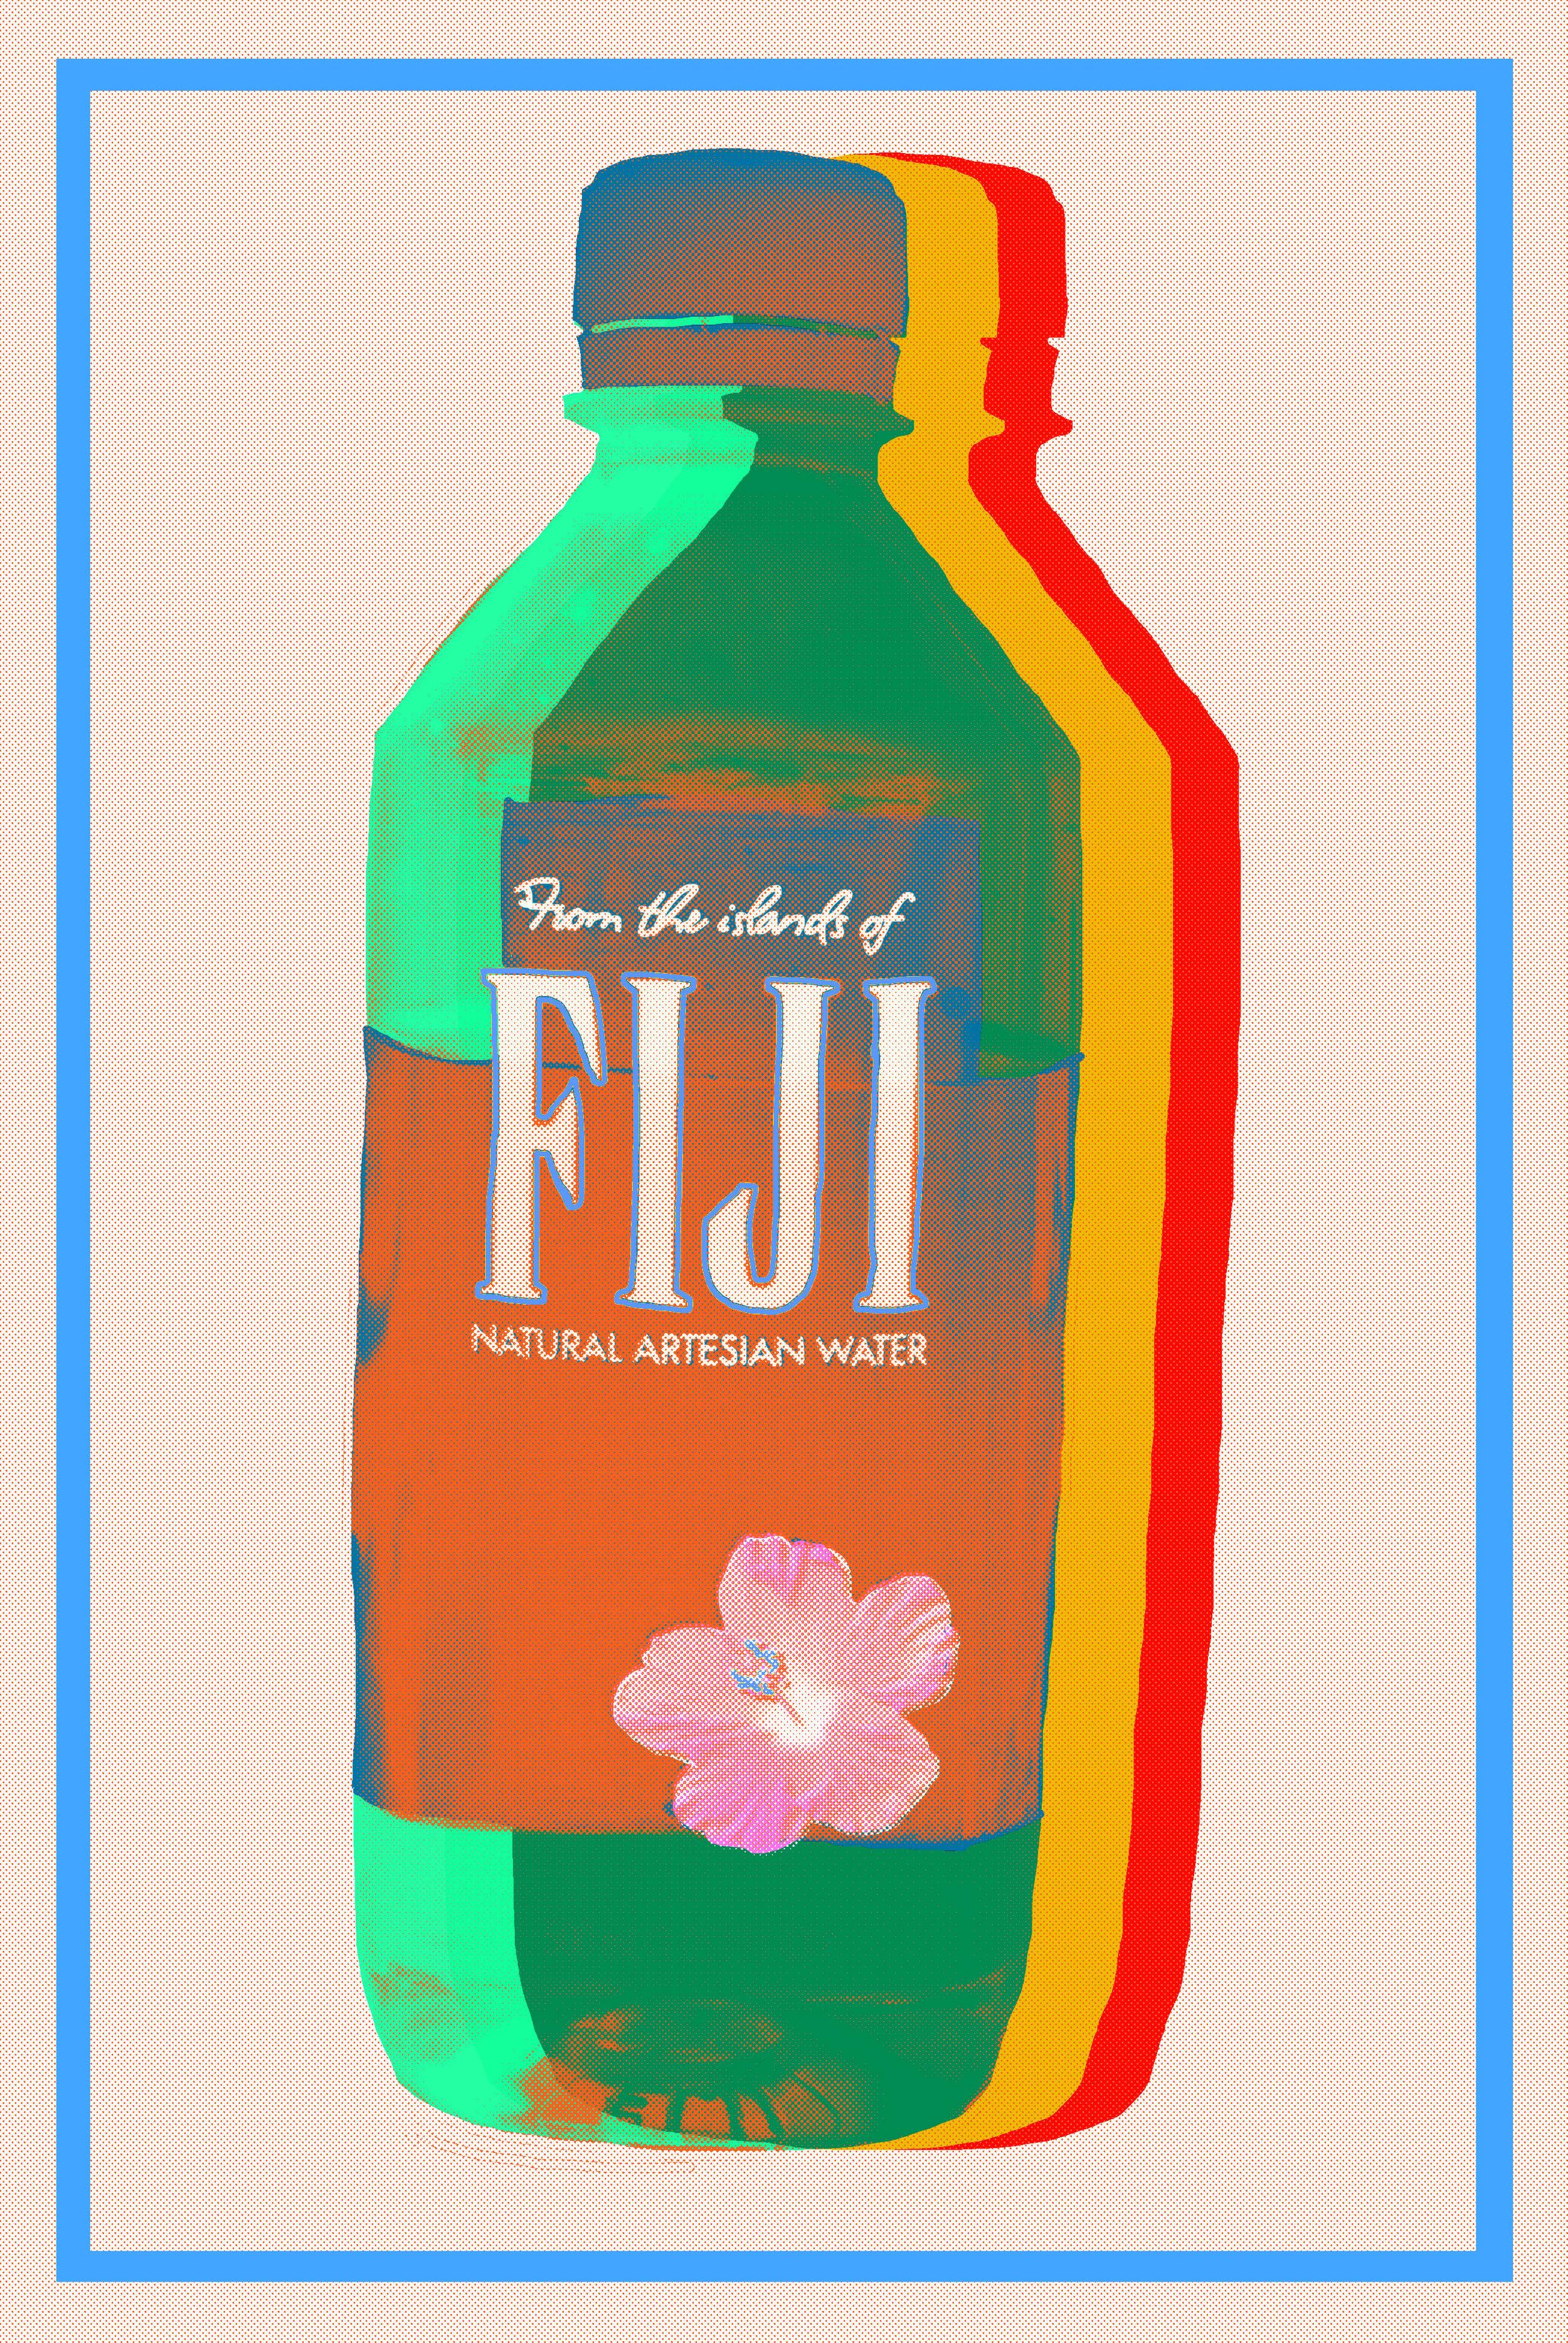 "Fiji White  Giclee Print  11"" x 8.5""  15 edition + 2 AP  2018"